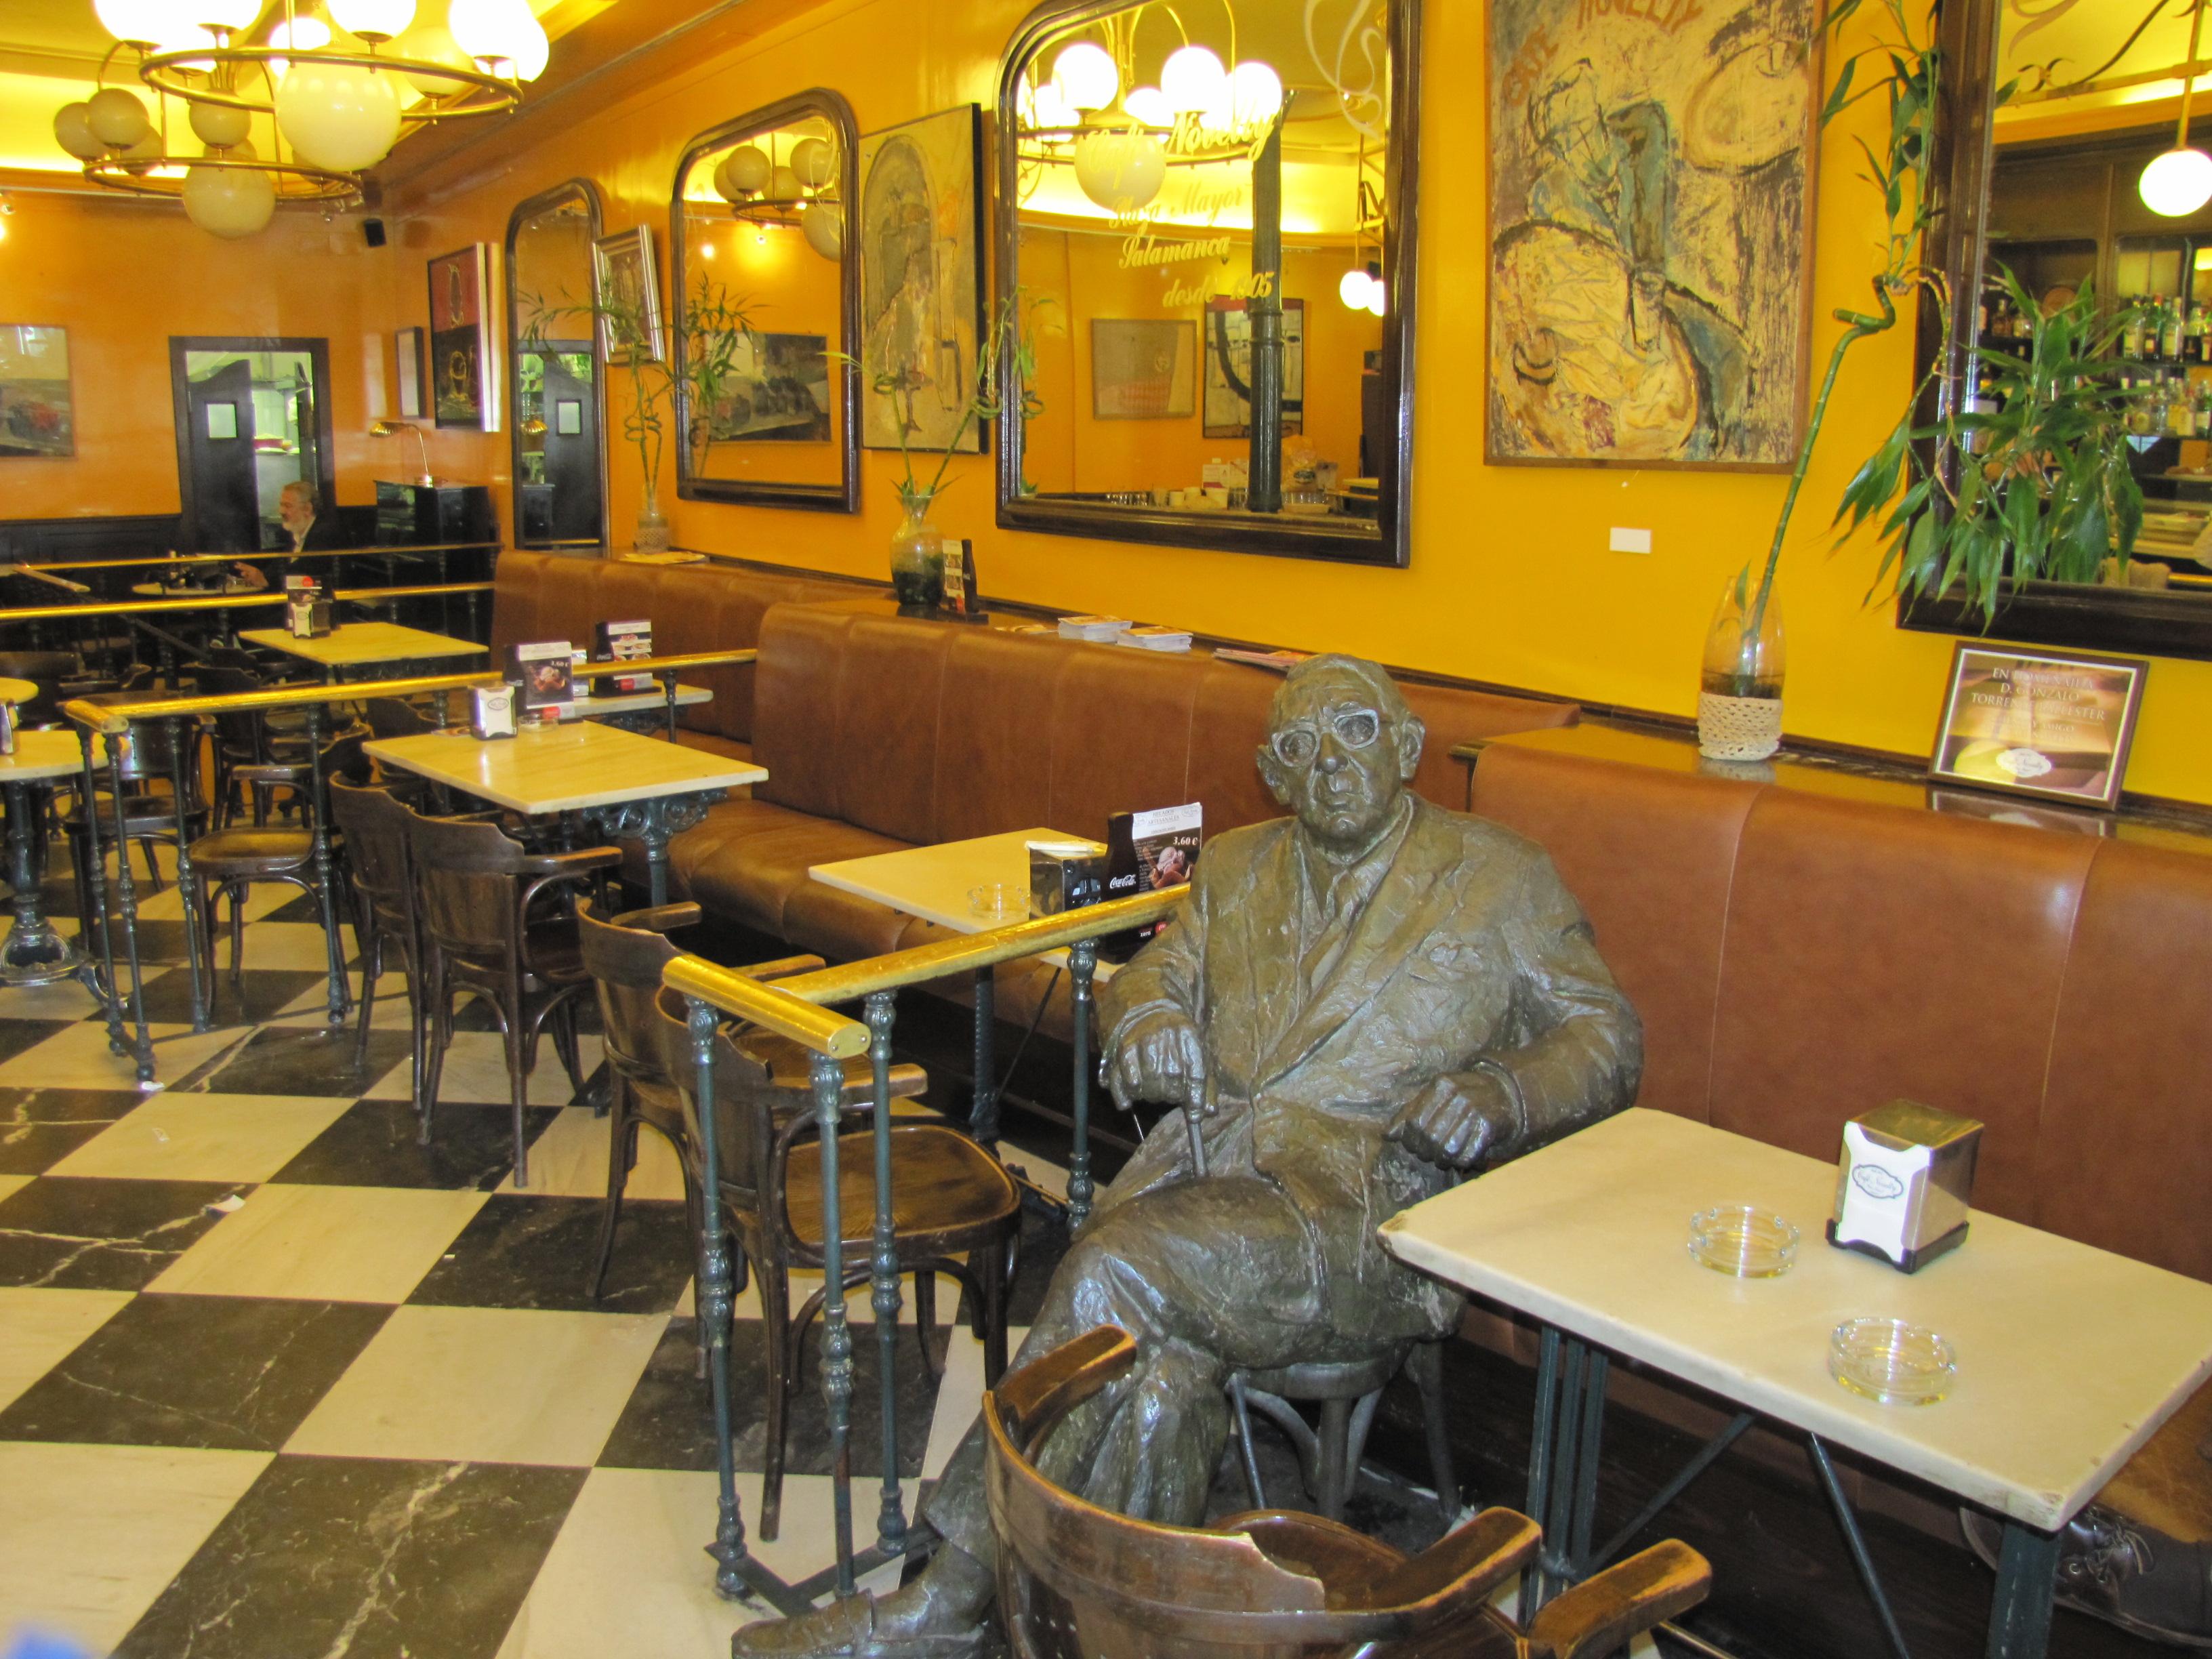 Cafe Madrid Restaurant Slc